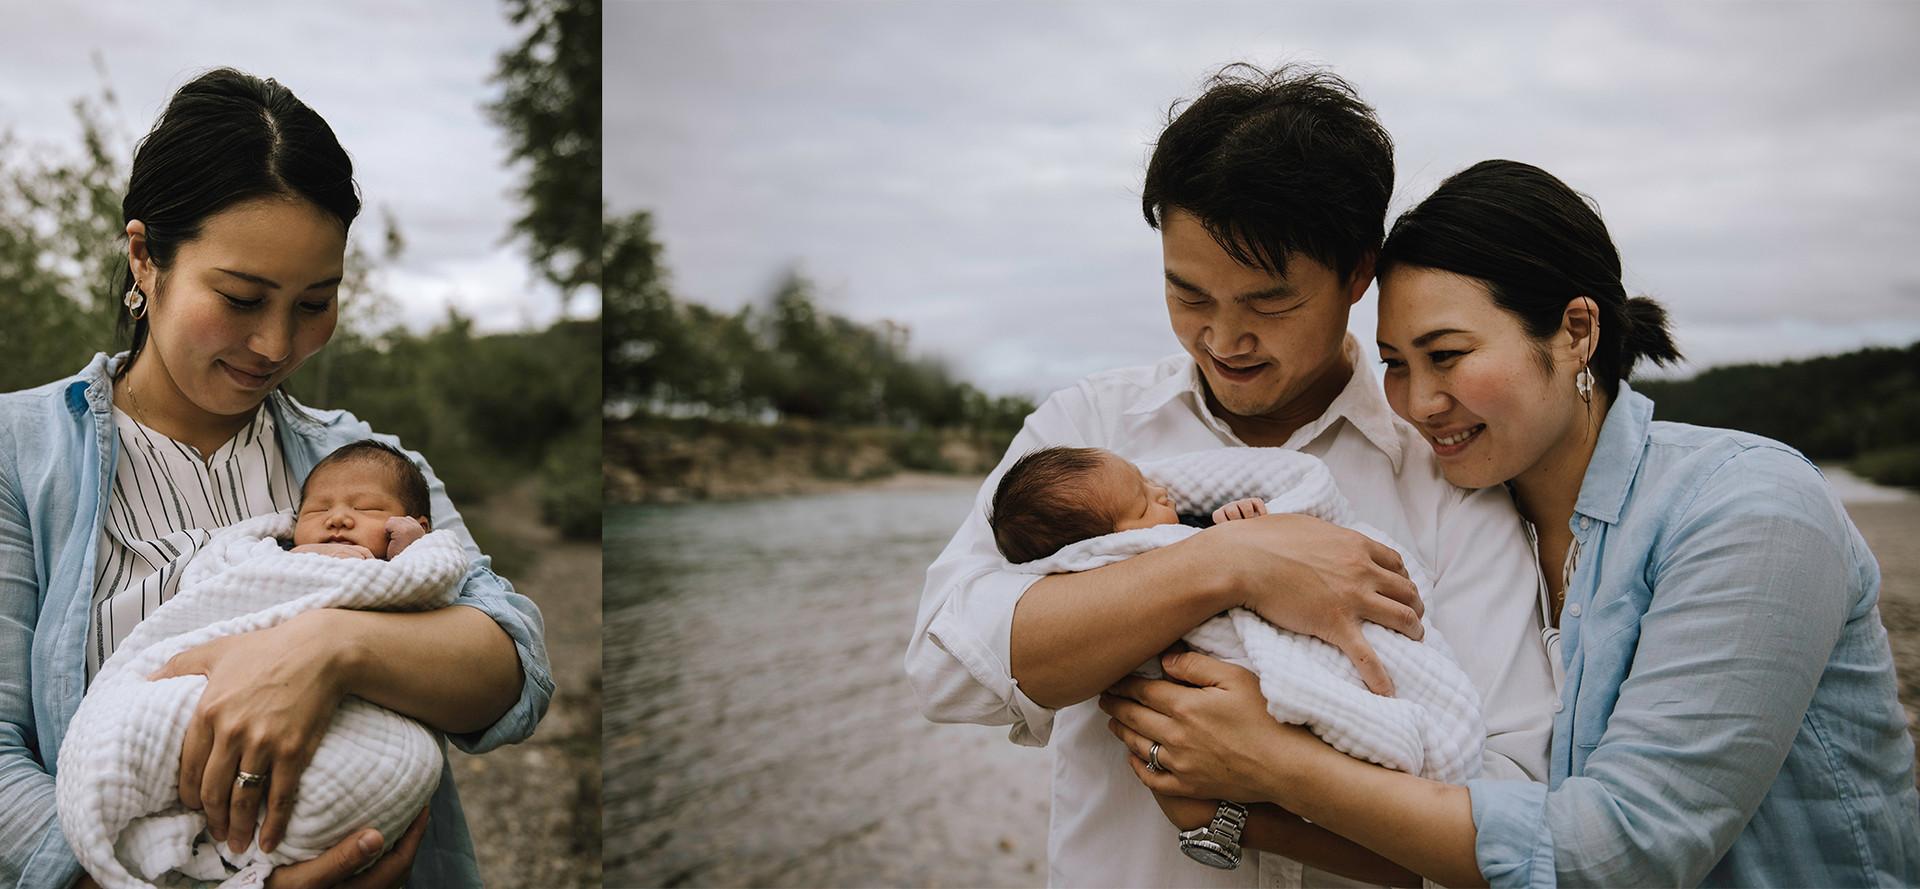 Calgary Outdoor Newborn Photographer